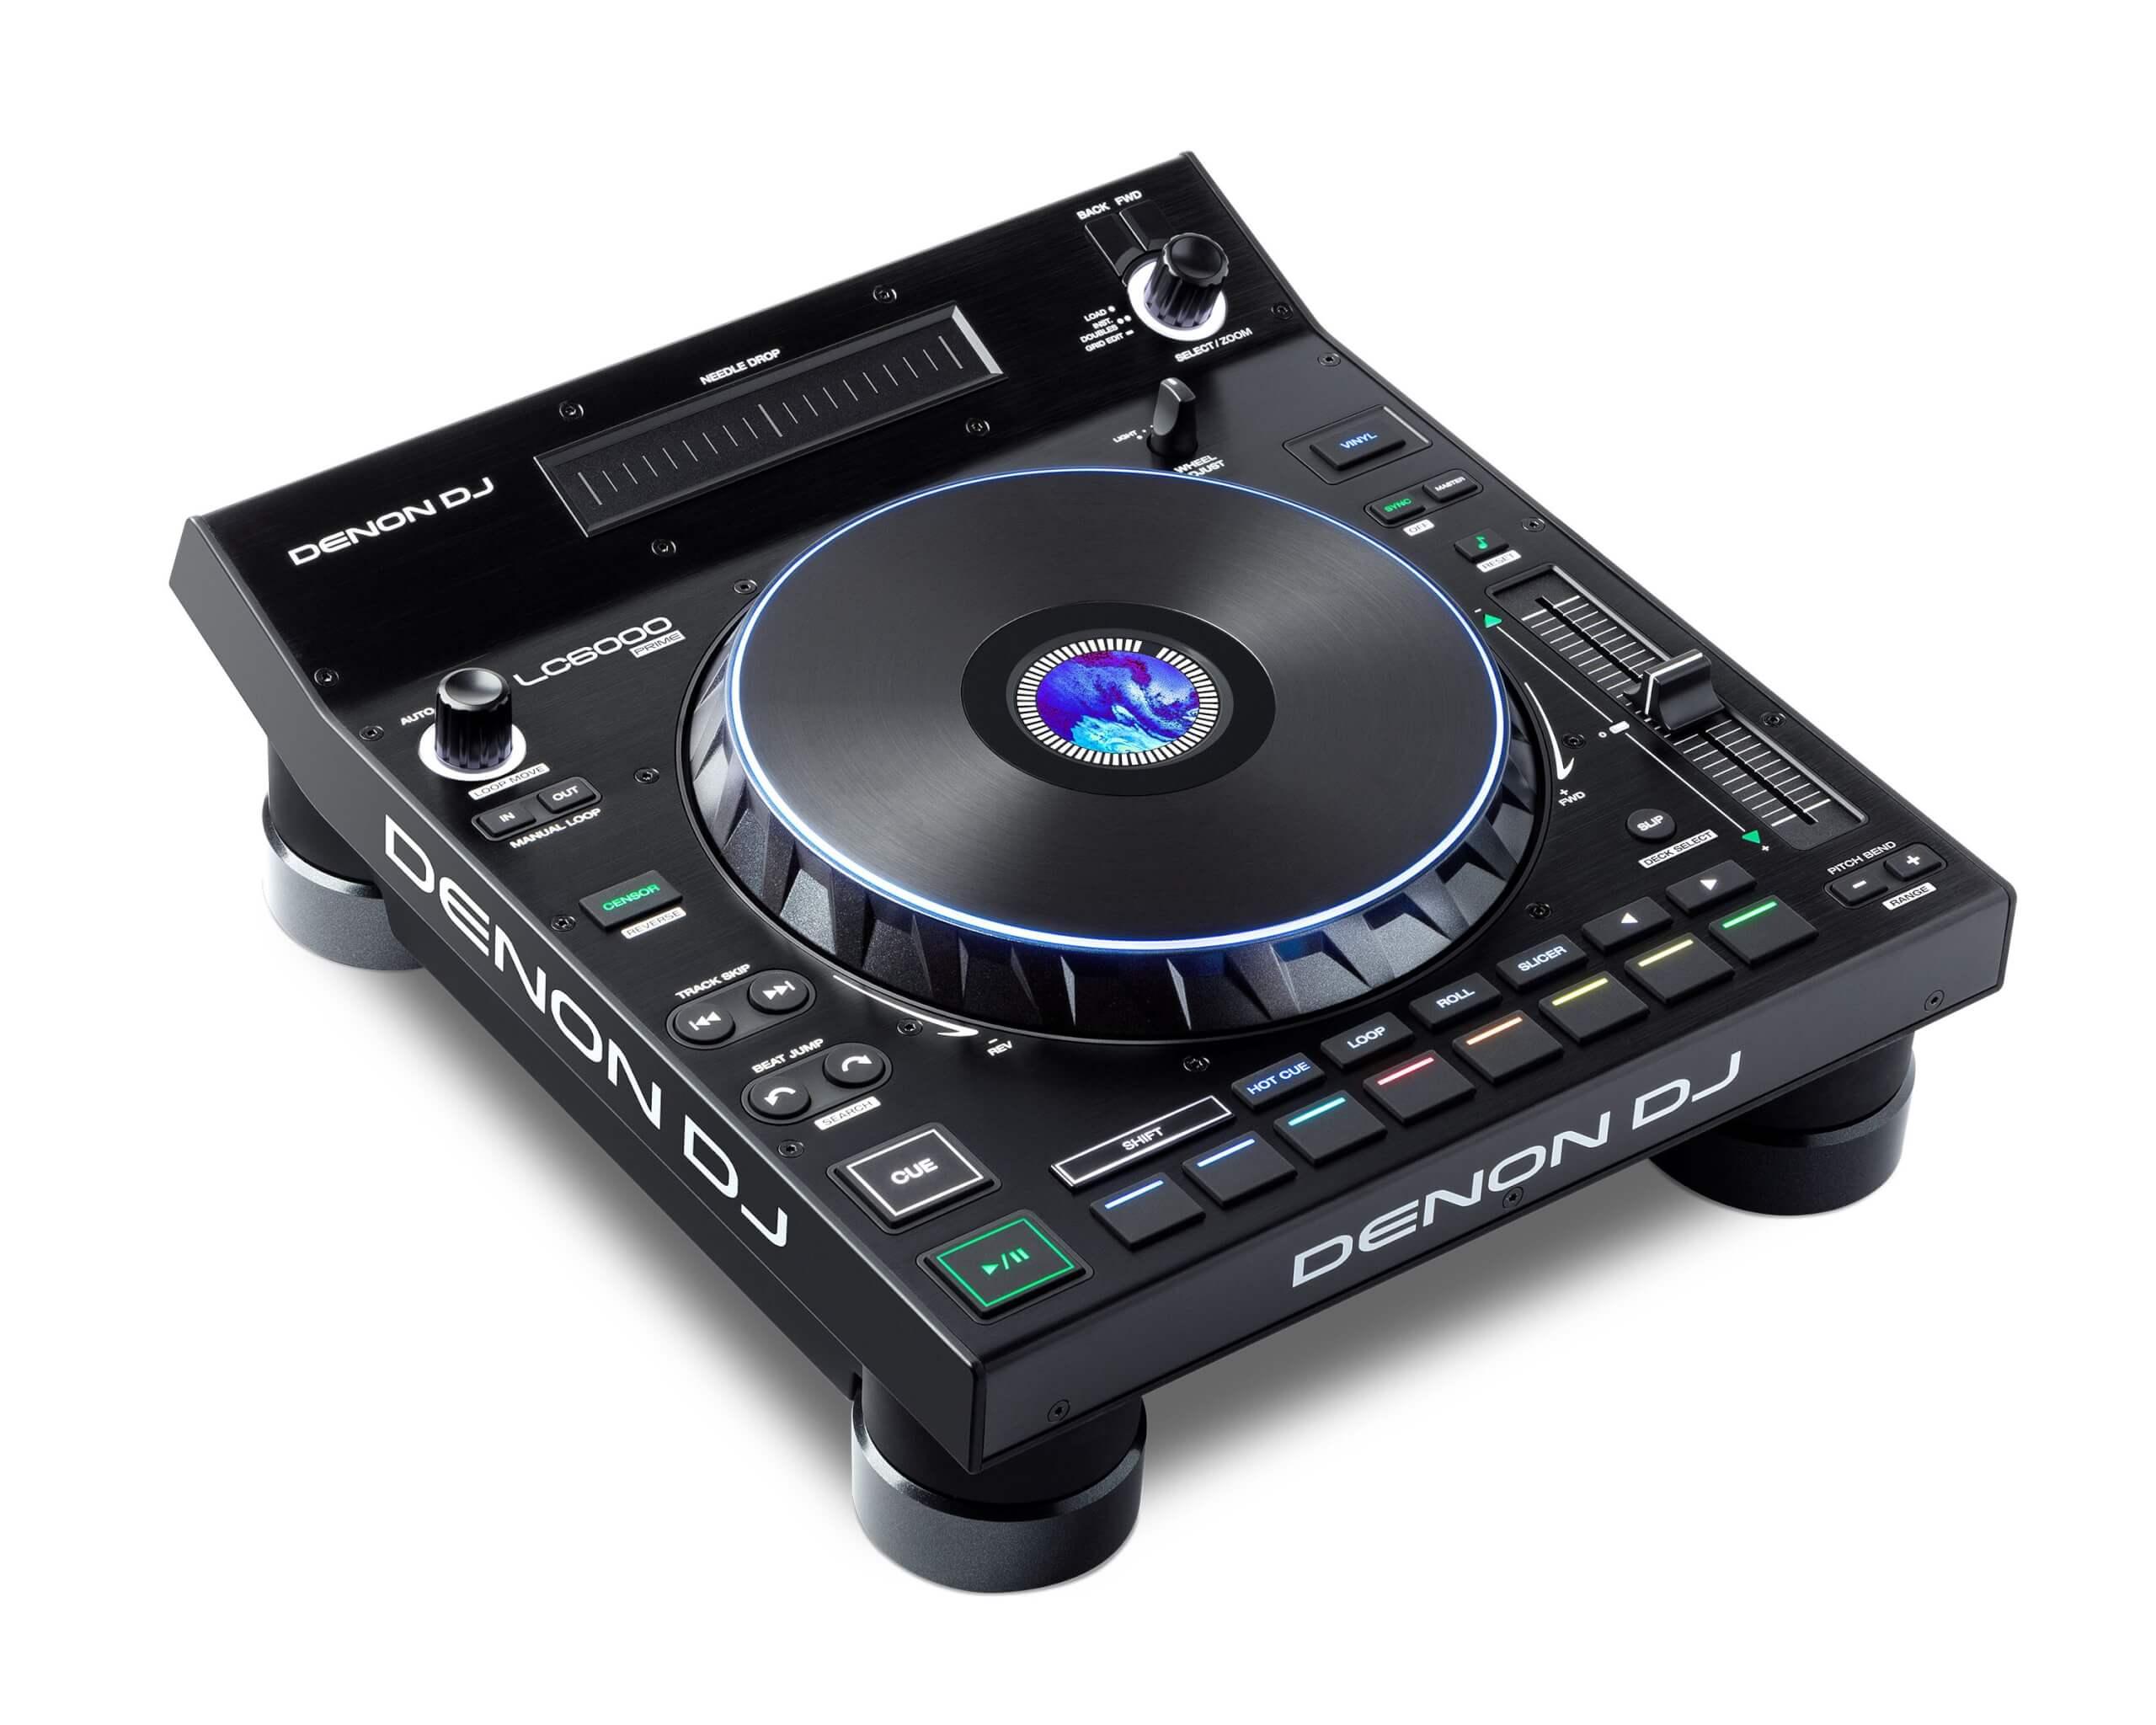 Denon DJ LC6000 PRIME product shot